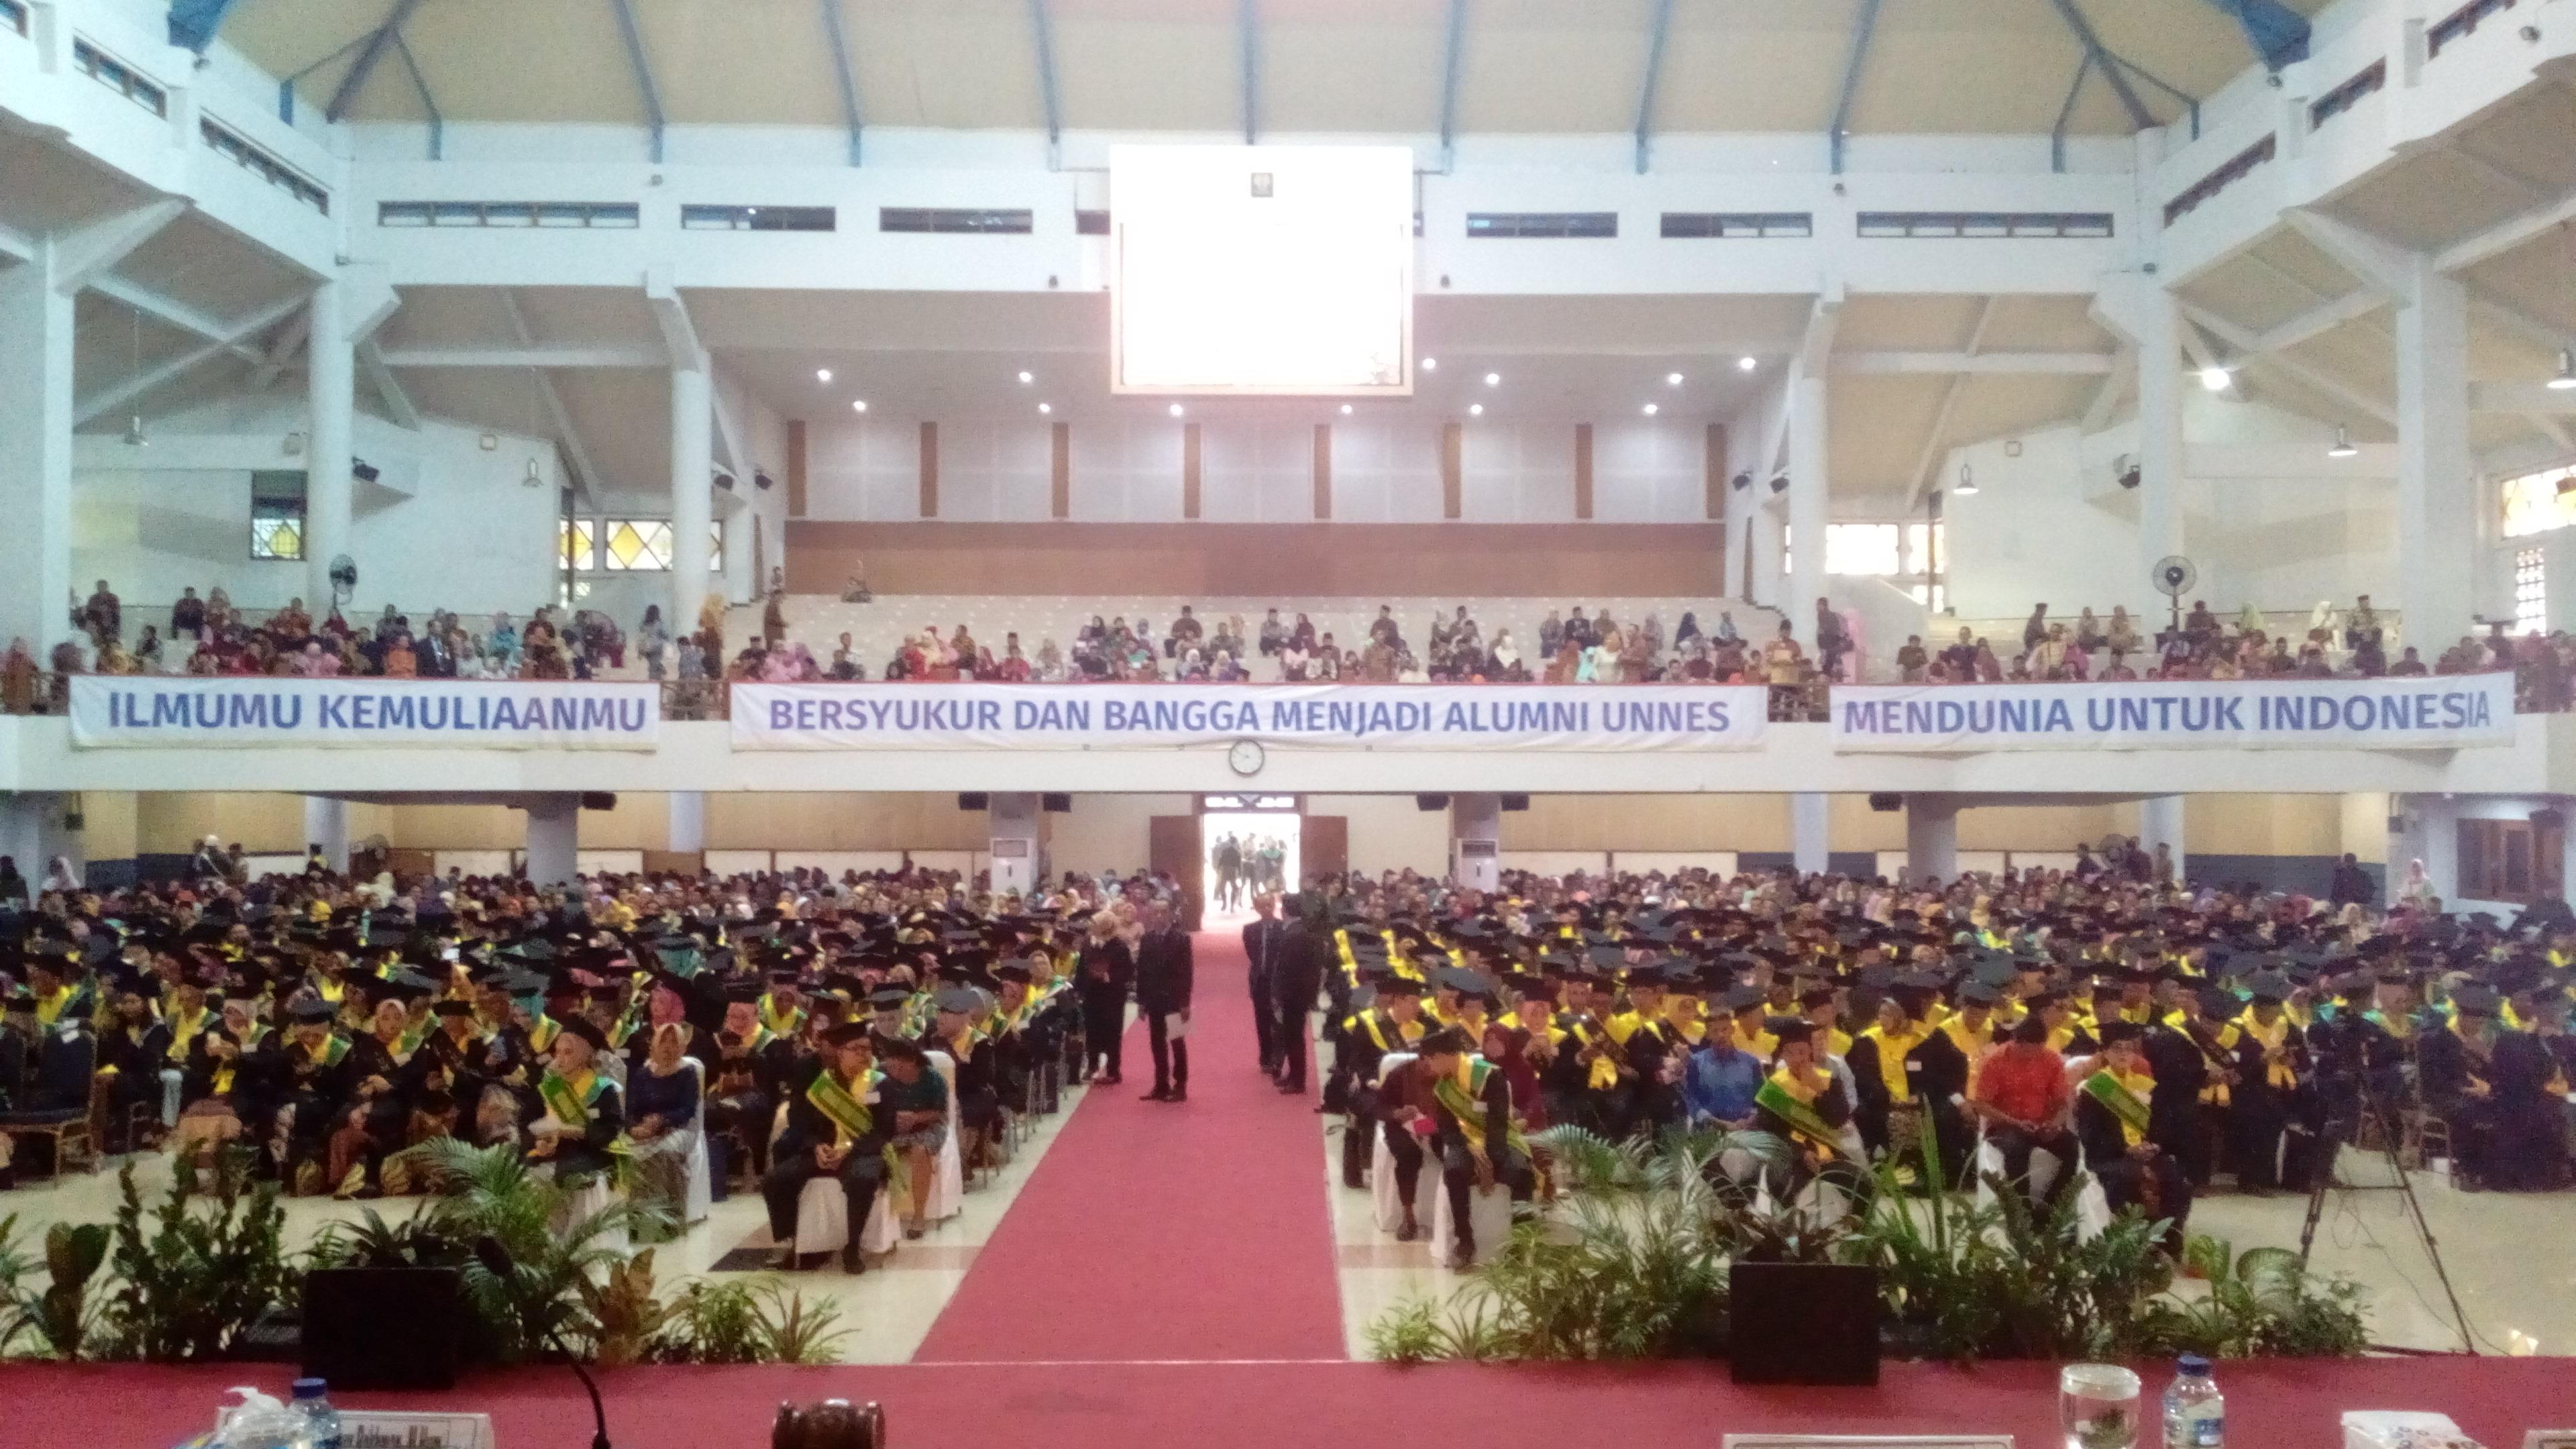 Ilmumu Kemuliaanmu, Mendunia untuk Indonesia, Tema  Wisuda Periode II 2019 UNNES